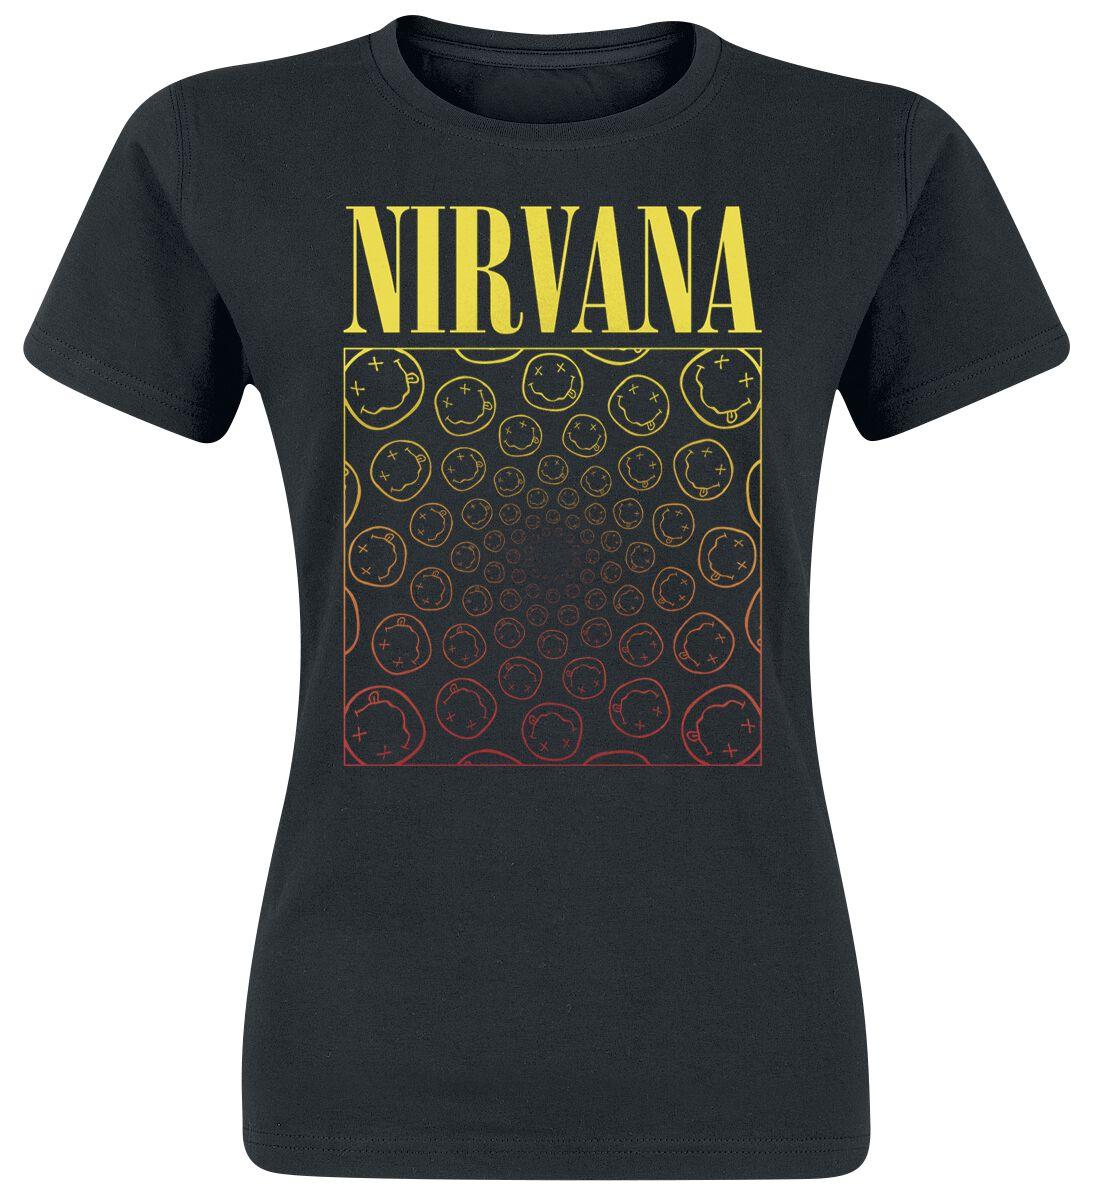 Zespoły - Koszulki - Koszulka damska Nirvana Spiral Smiley Koszulka damska czarny - 350917